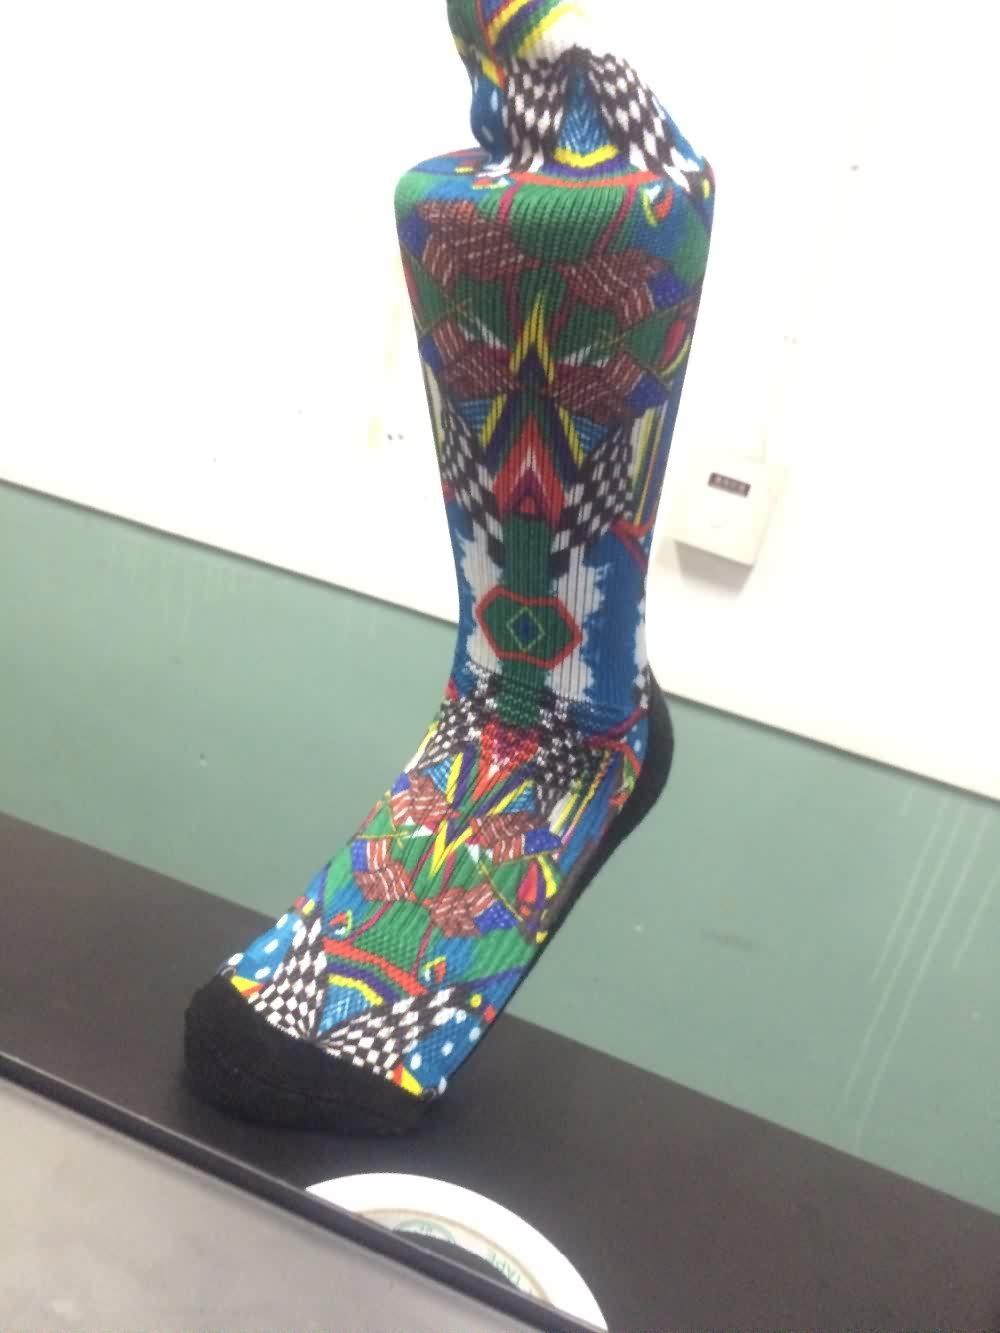 High quality socks printer, textile socks fabric printer, rotary socks machine for sale